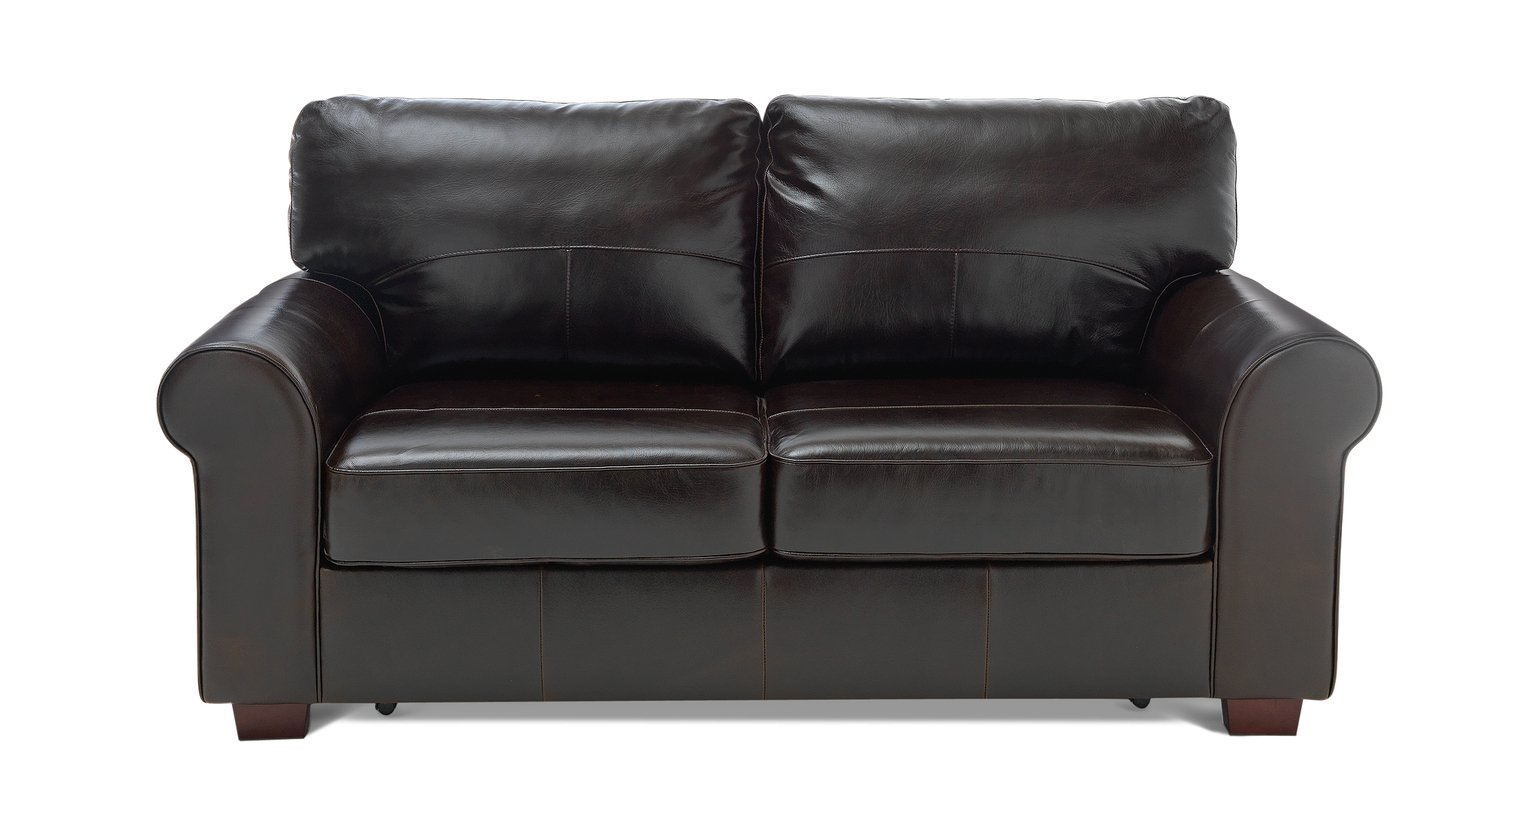 Argos Home Salisbury 2 Seater Leather Sofa Bed - Dark Brown